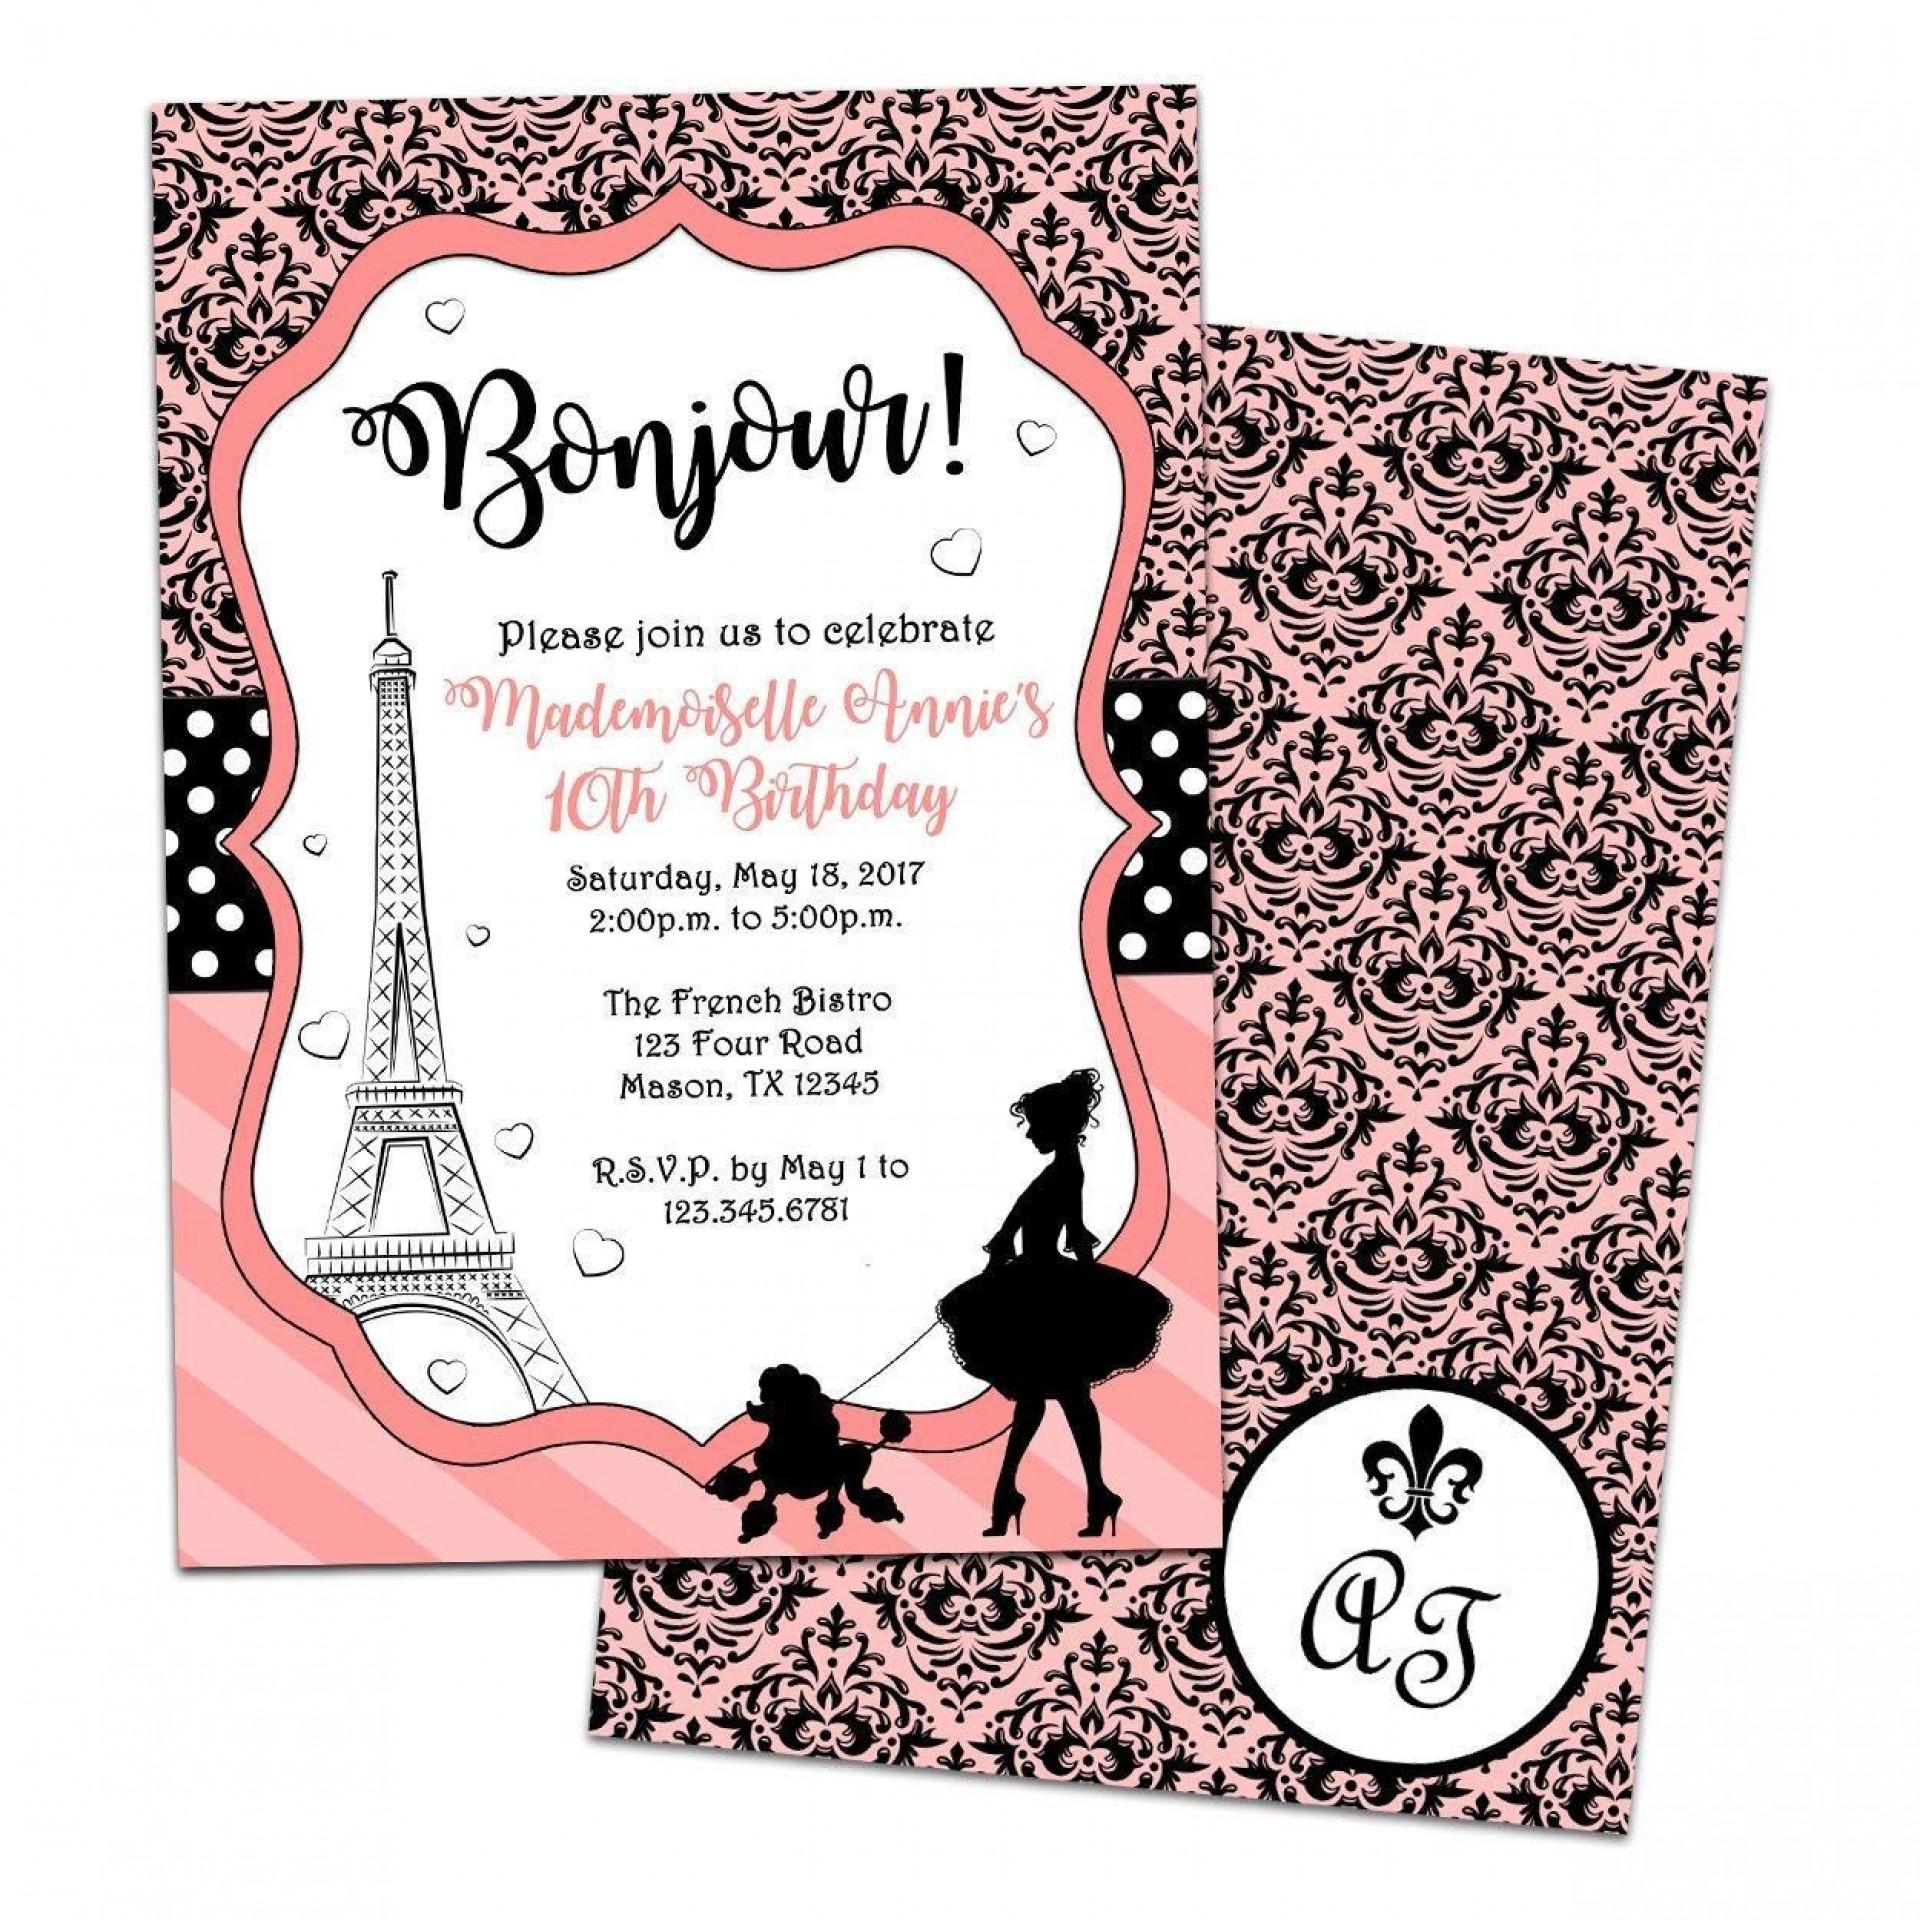 002 Beautiful Pari Birthday Invitation Template Free Concept 1920